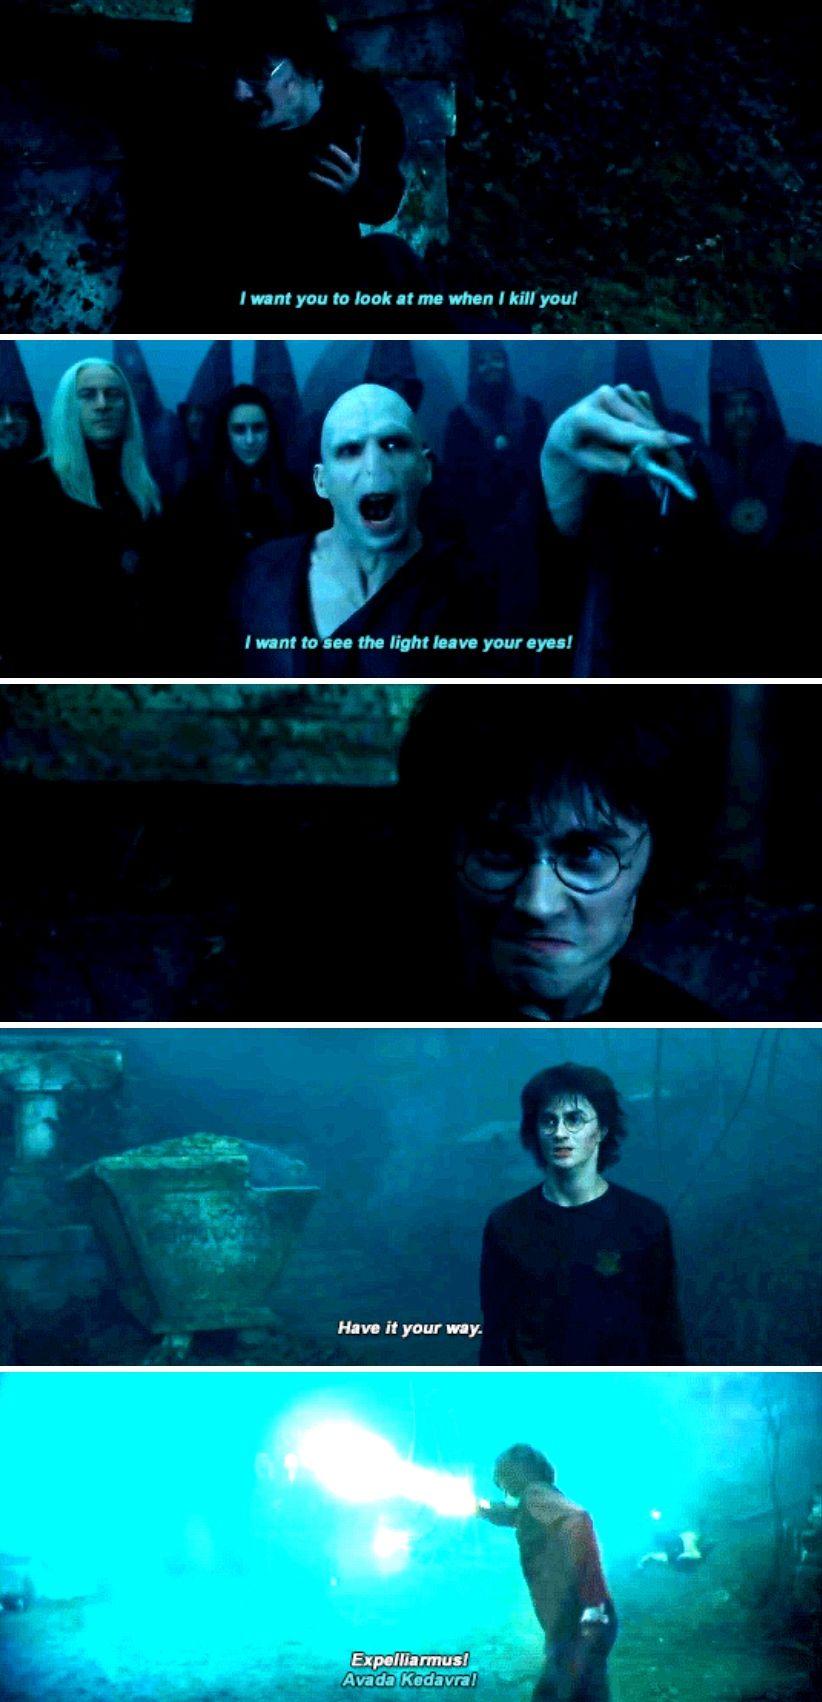 Expelliarmus Vs Avada Kedavra Harry Potter Universal Harry James Potter Harry Potter Obsession